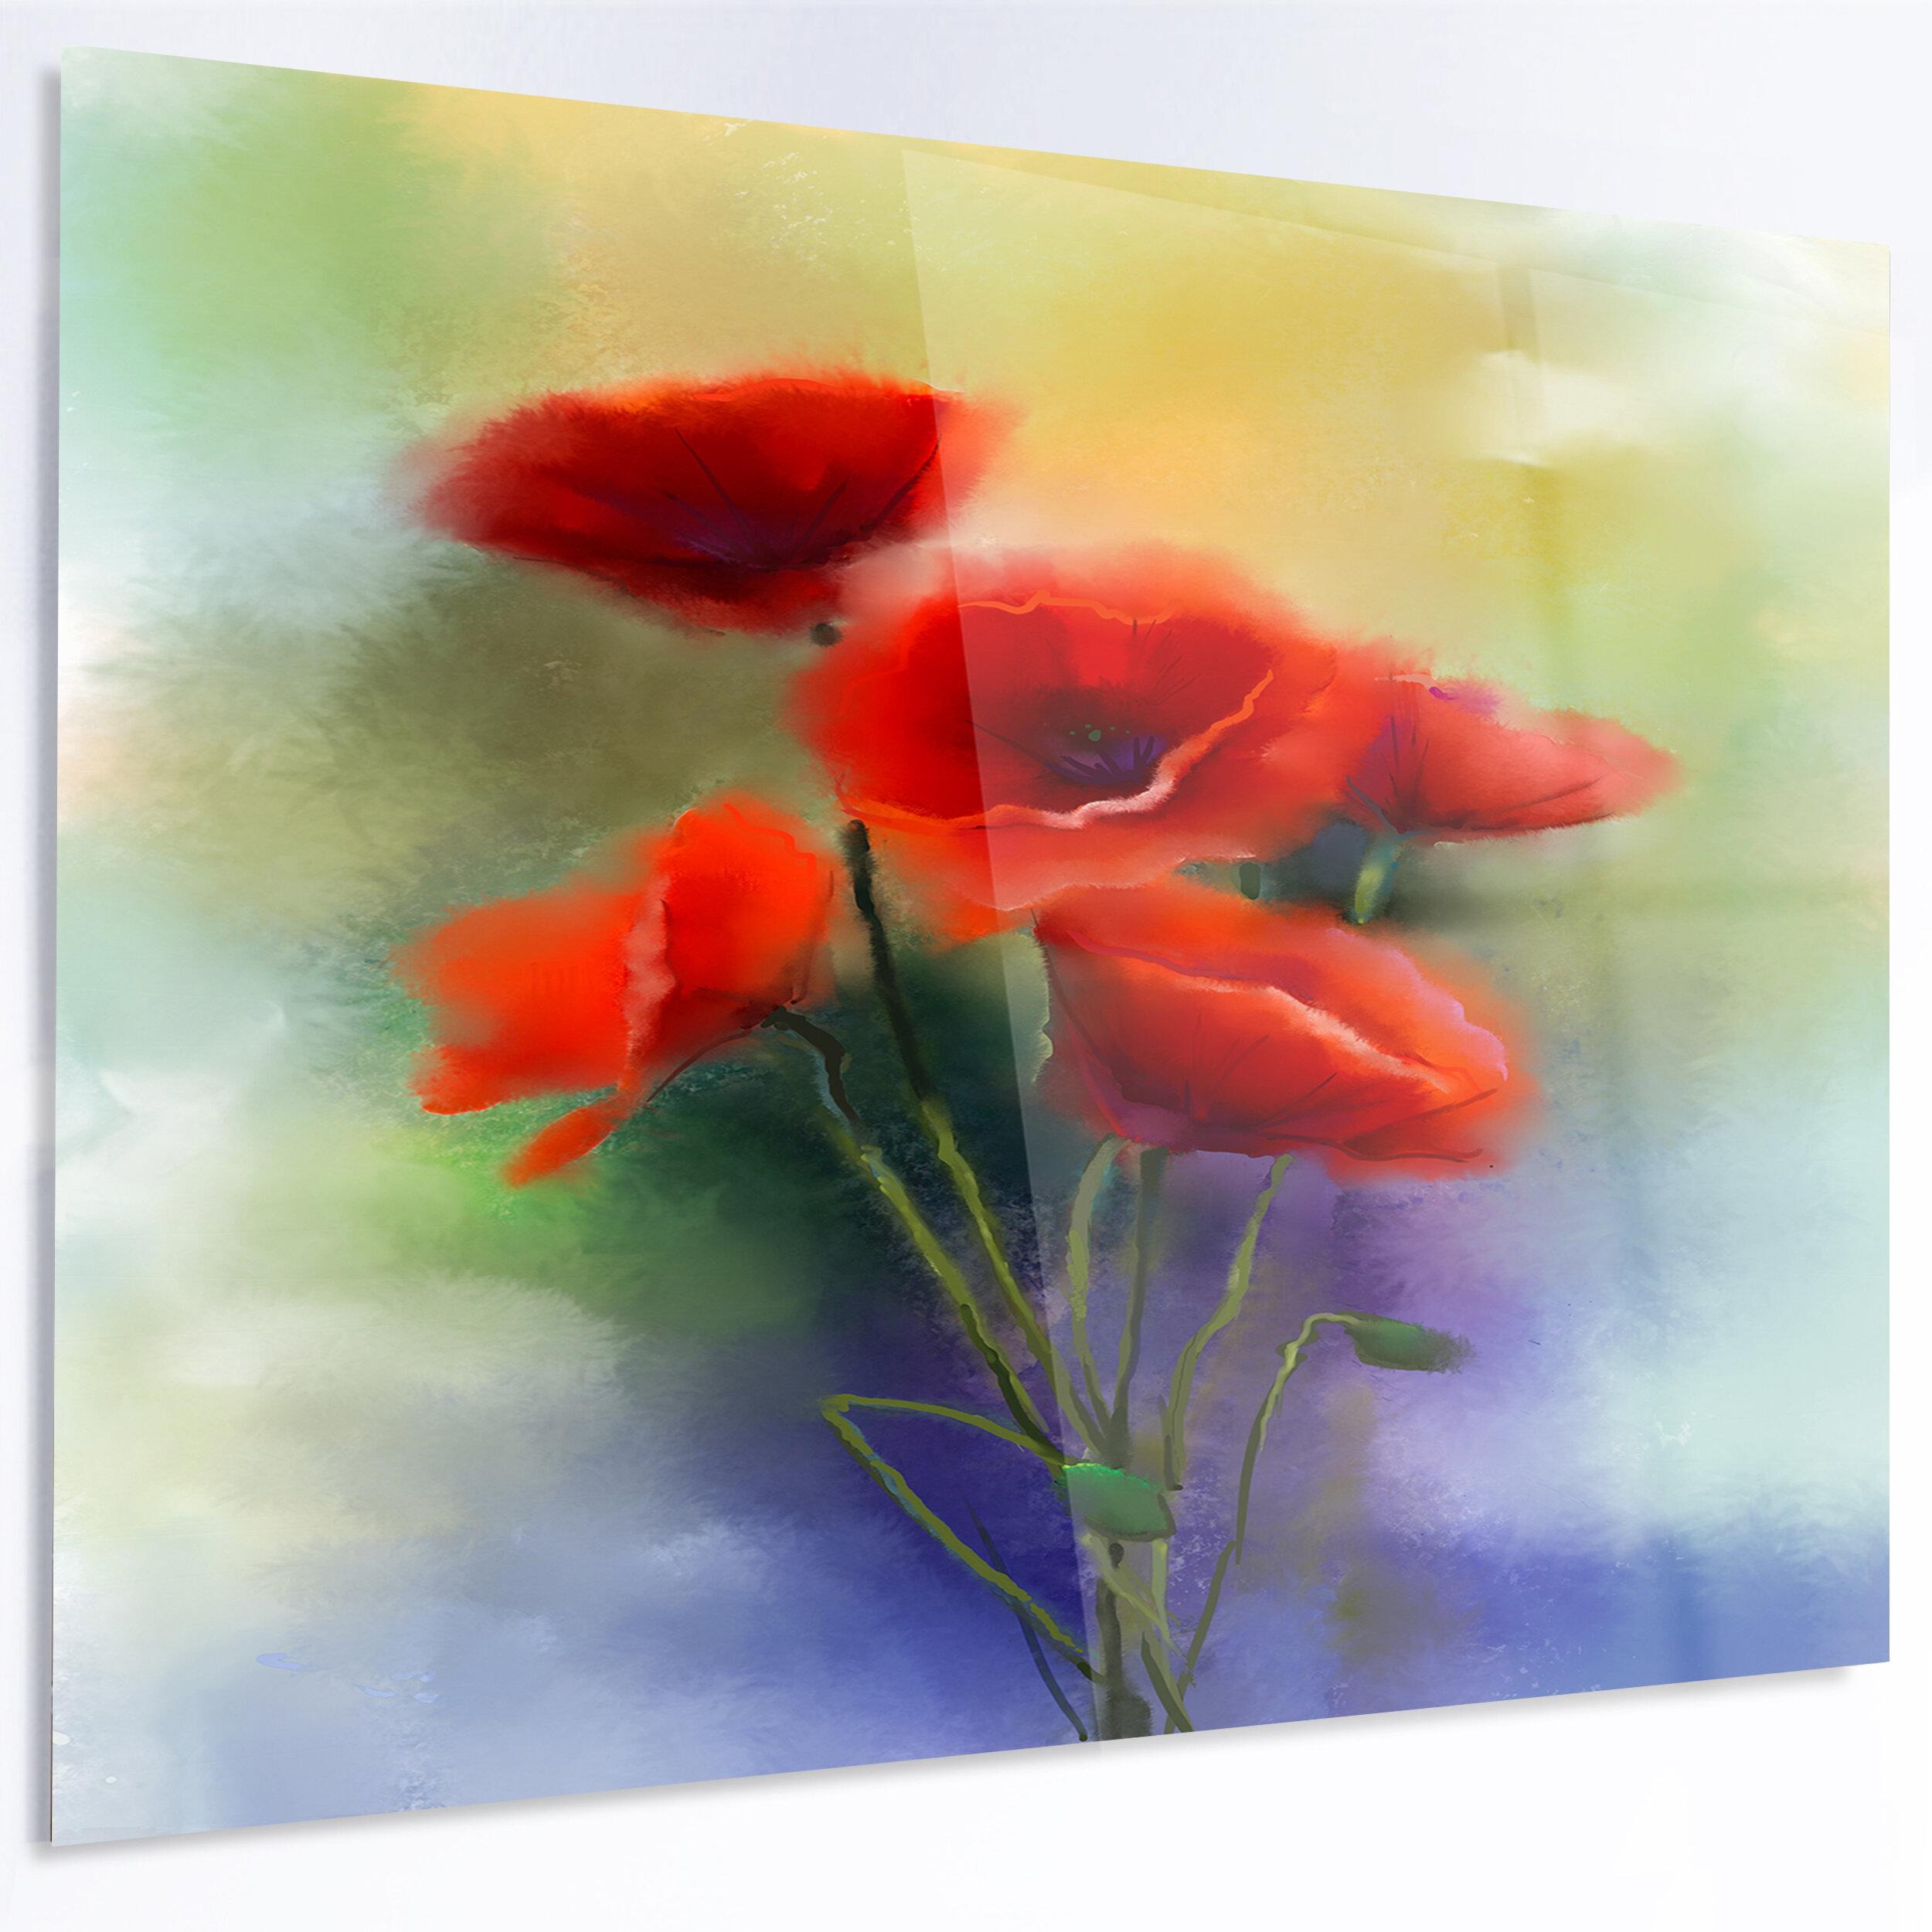 Designart Red Poppy Flowers Watercolor Painting Print On Metal